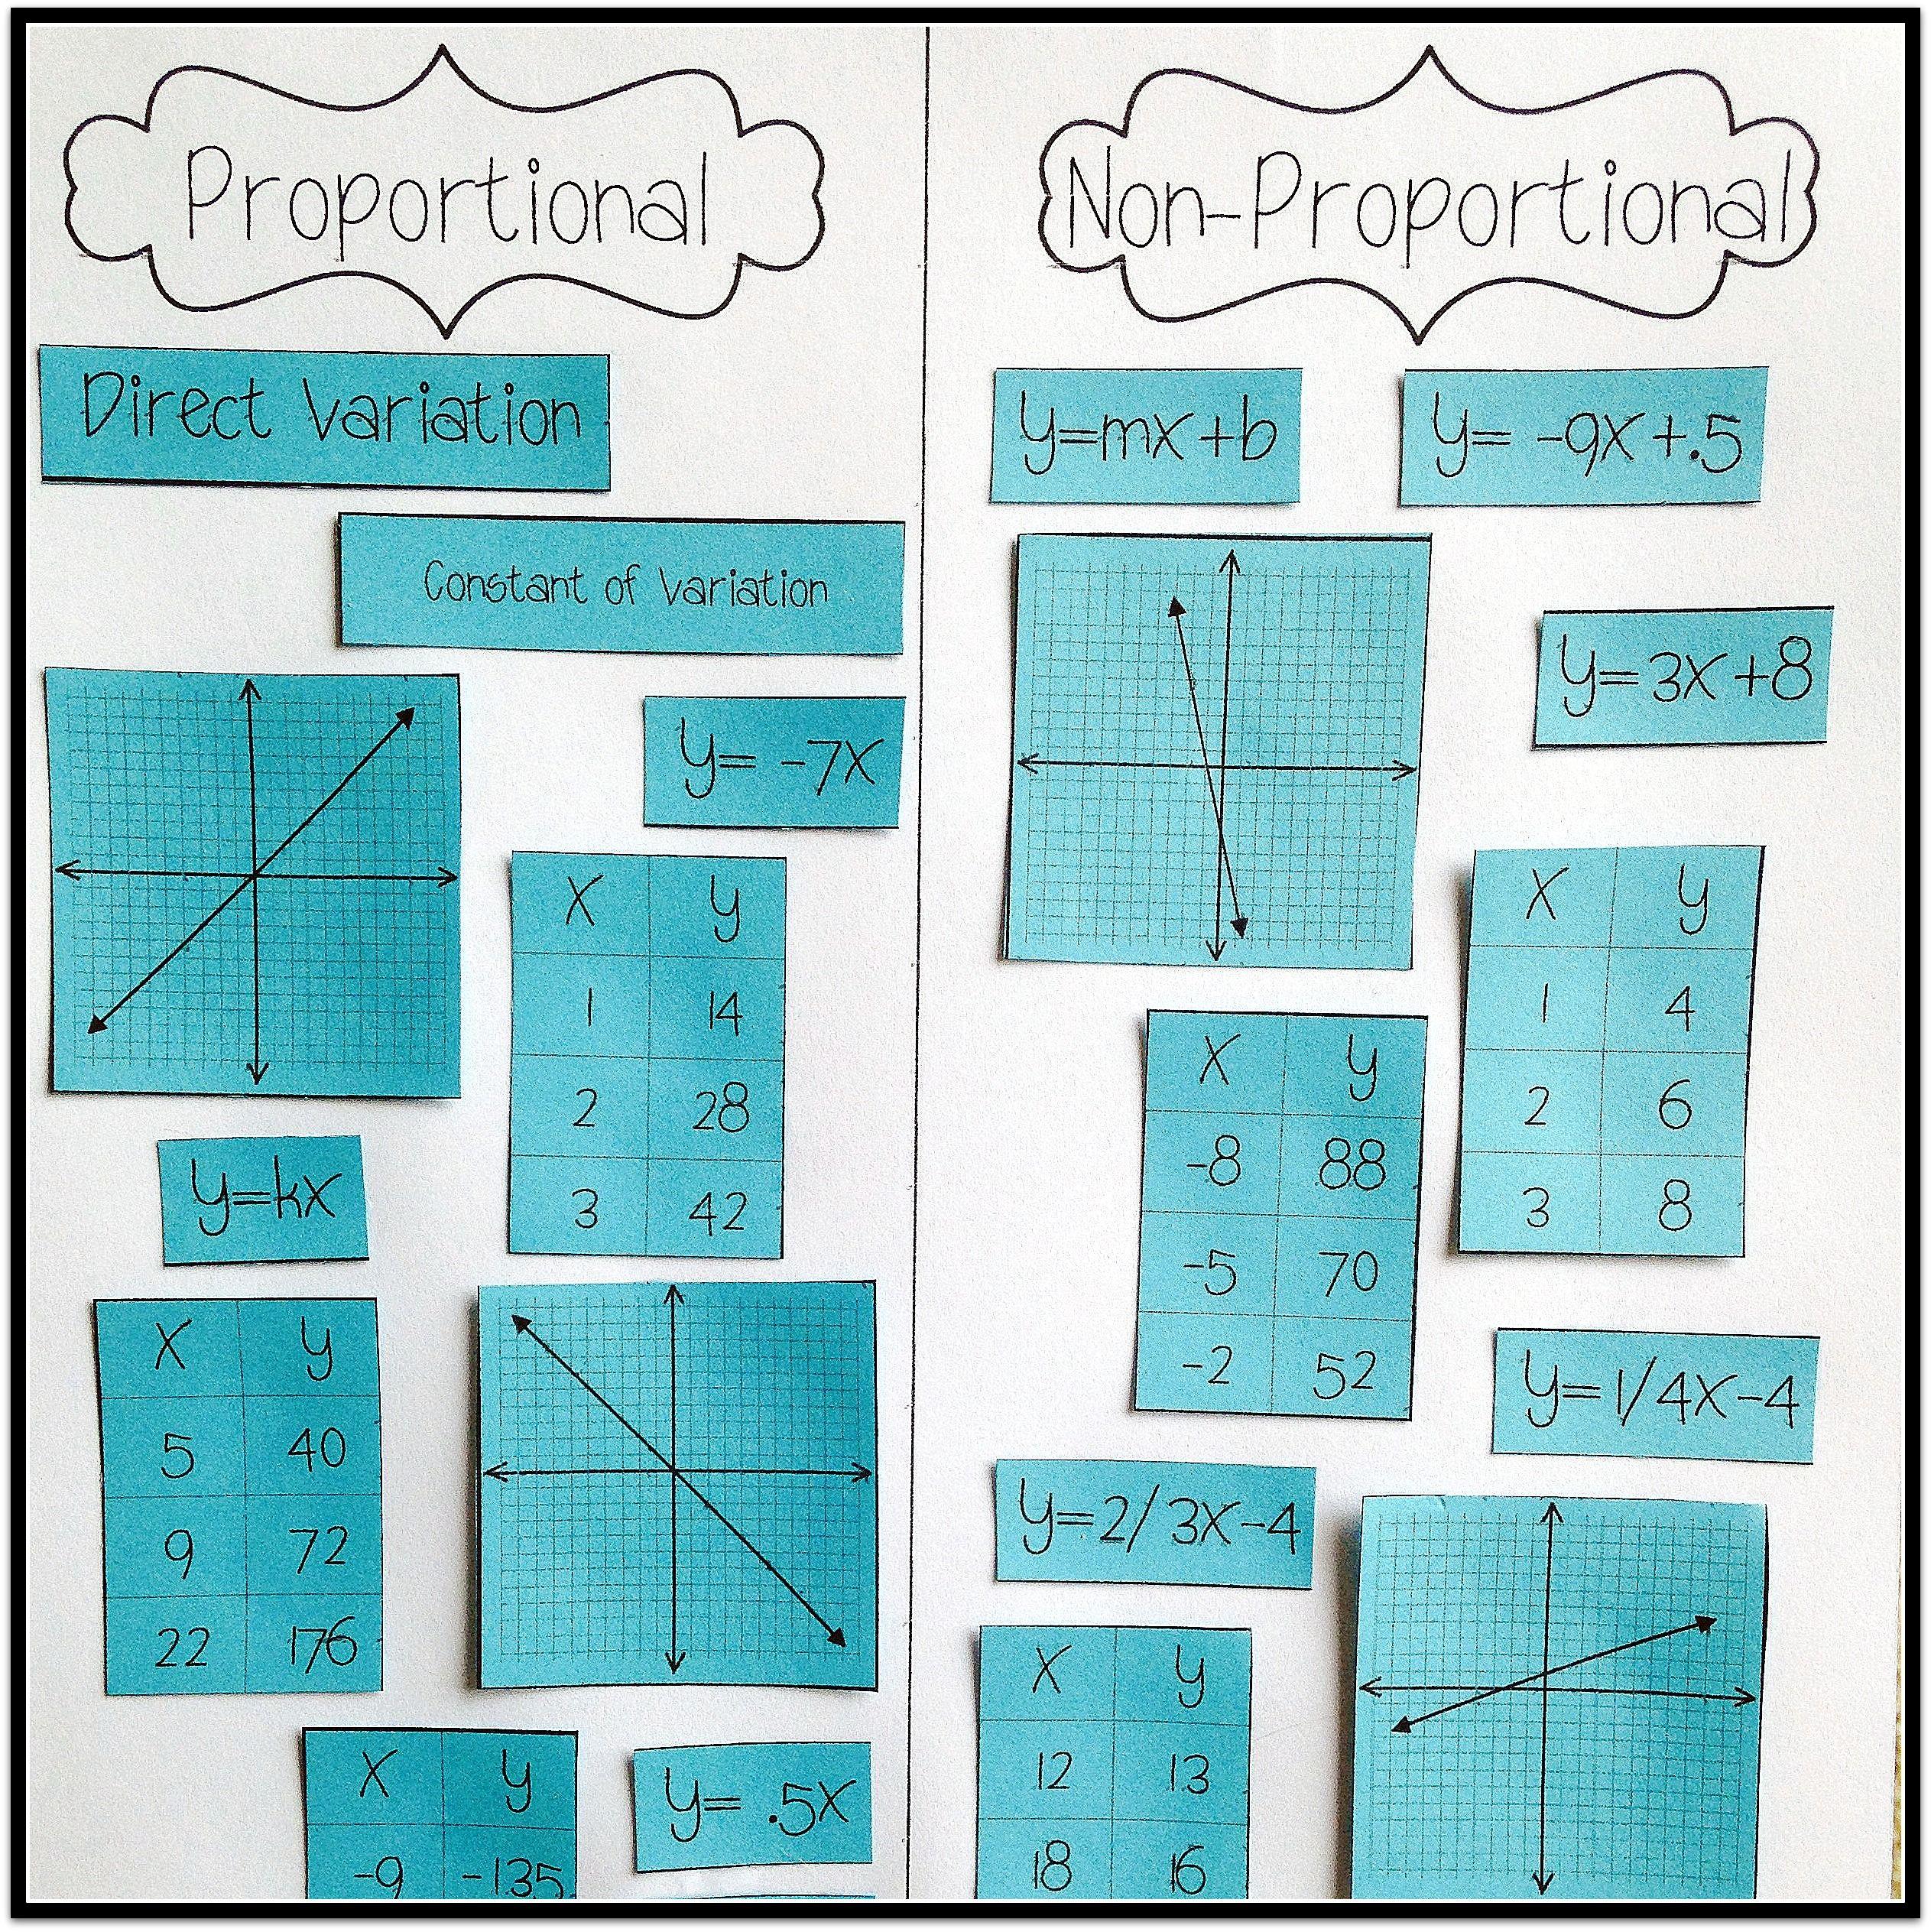 Proportional Vs Non Proportional Card Sort Amp Homework